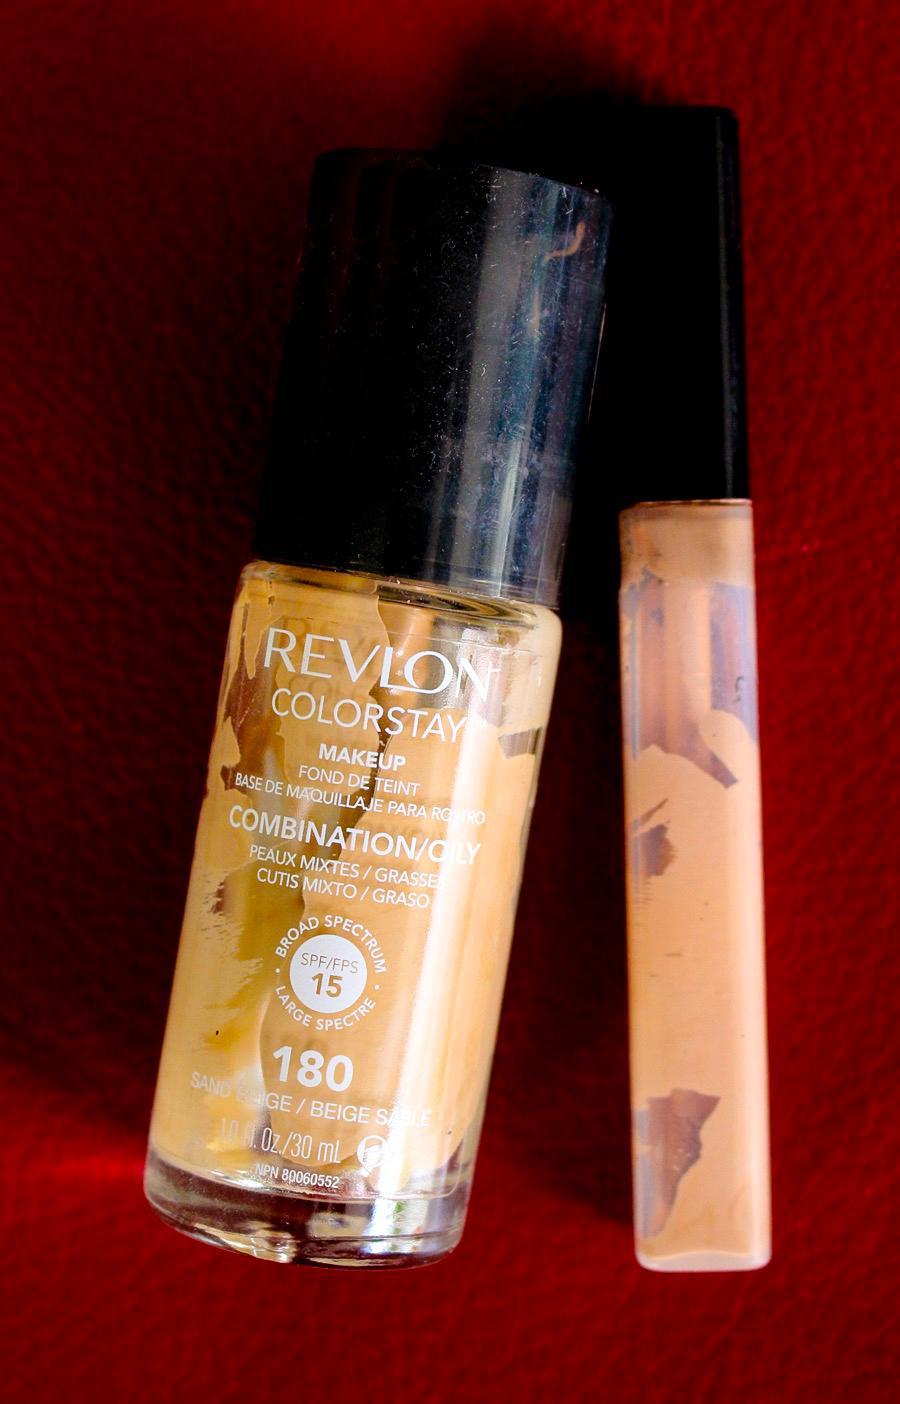 Aufgebraucht: Revlon Colorstay 180 Sand Beige, Maybelline Fit me Concealer